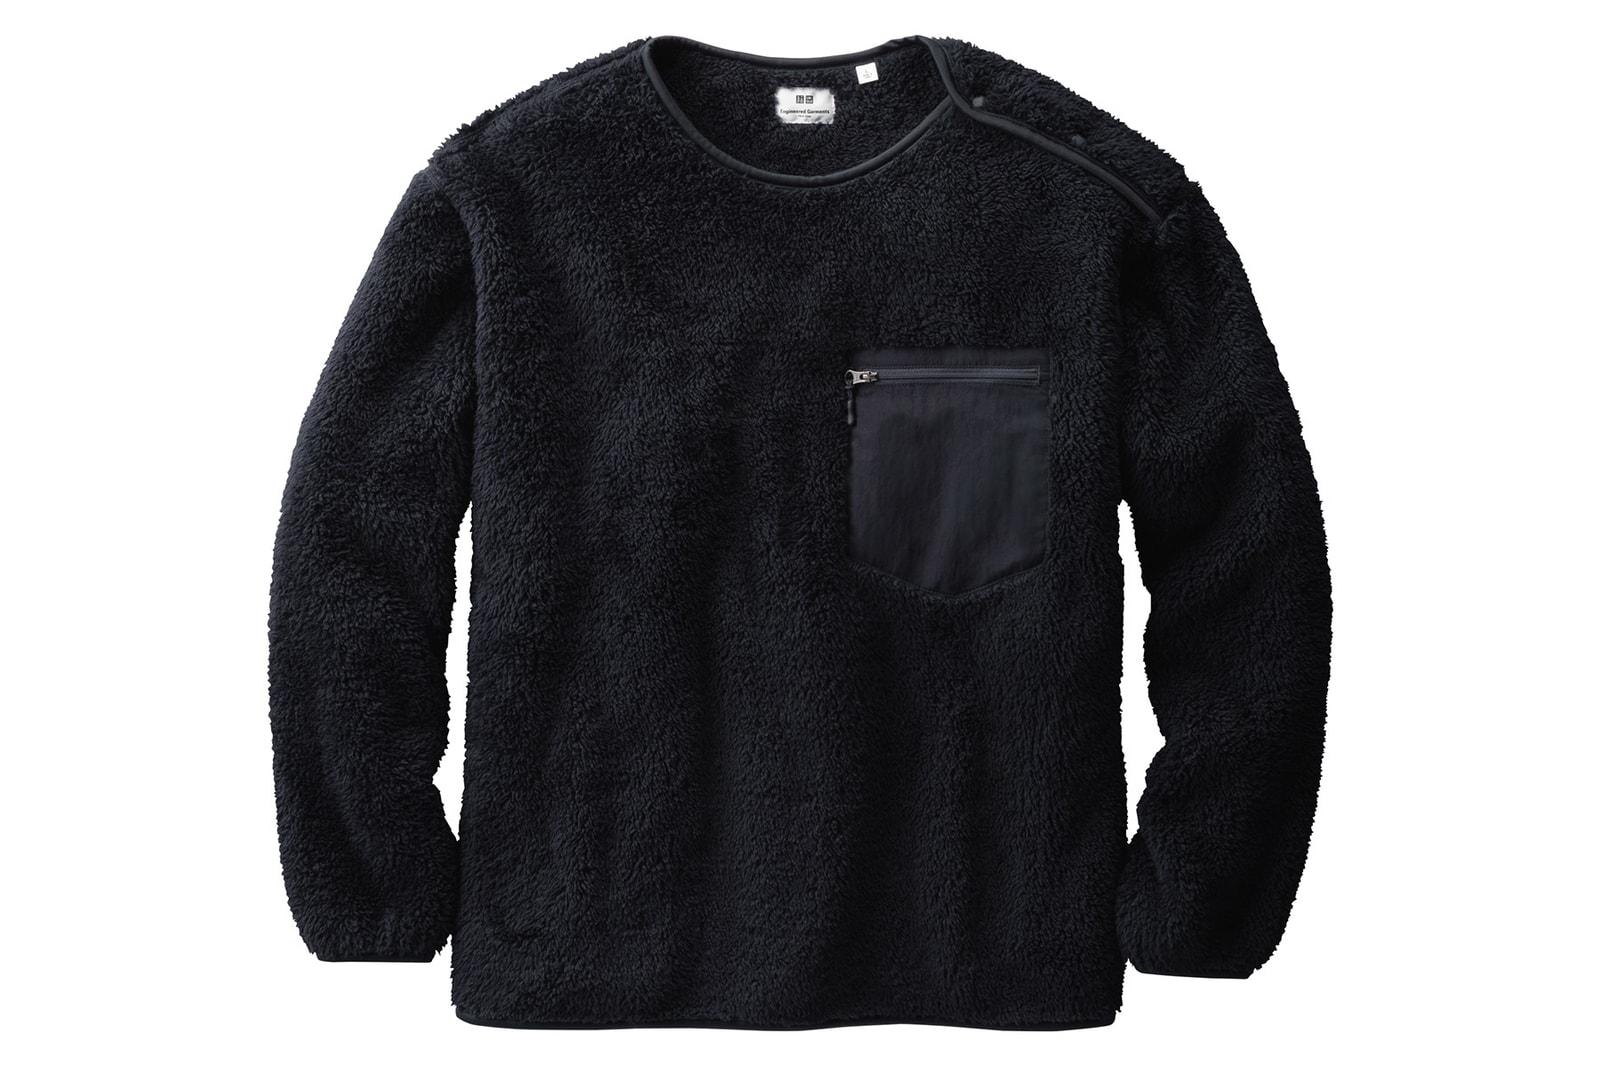 UNIQLO and Engineered Garments 聯乘系列第二彈正式發佈